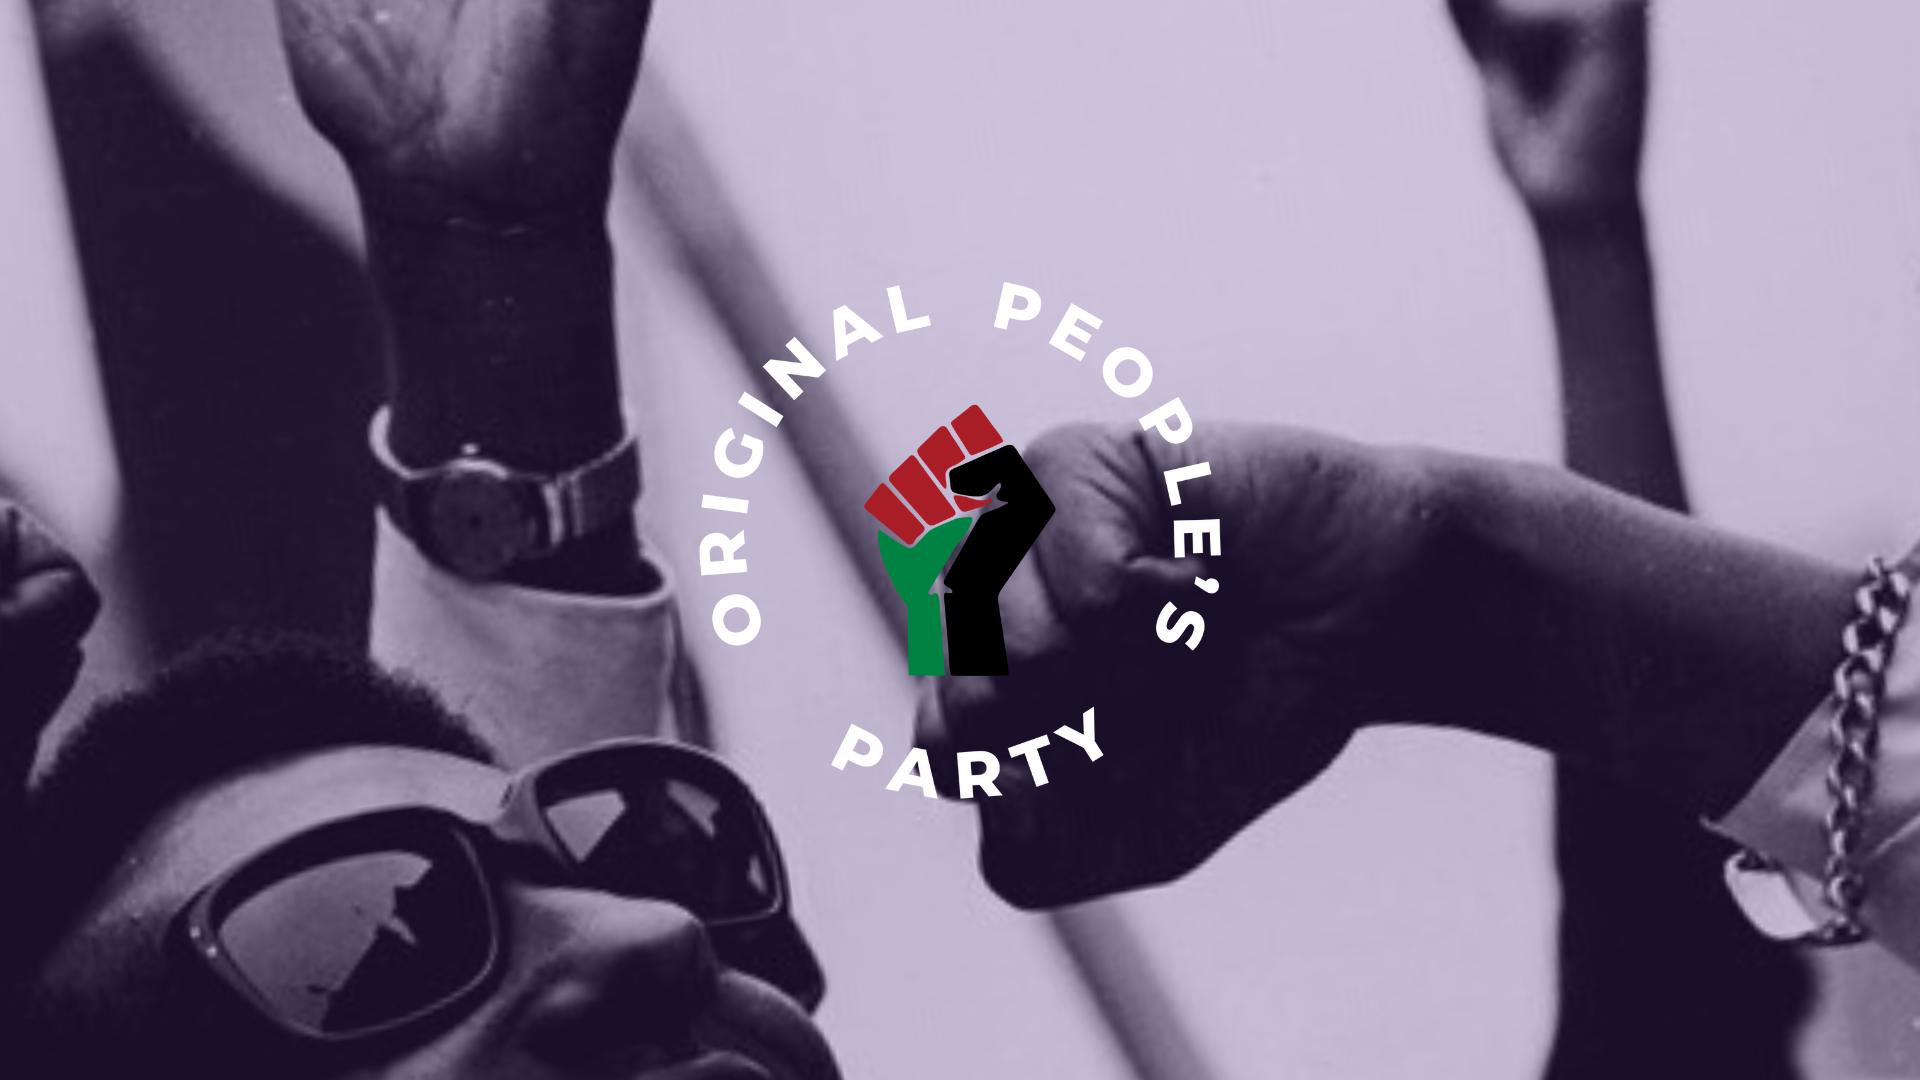 Original People's Party